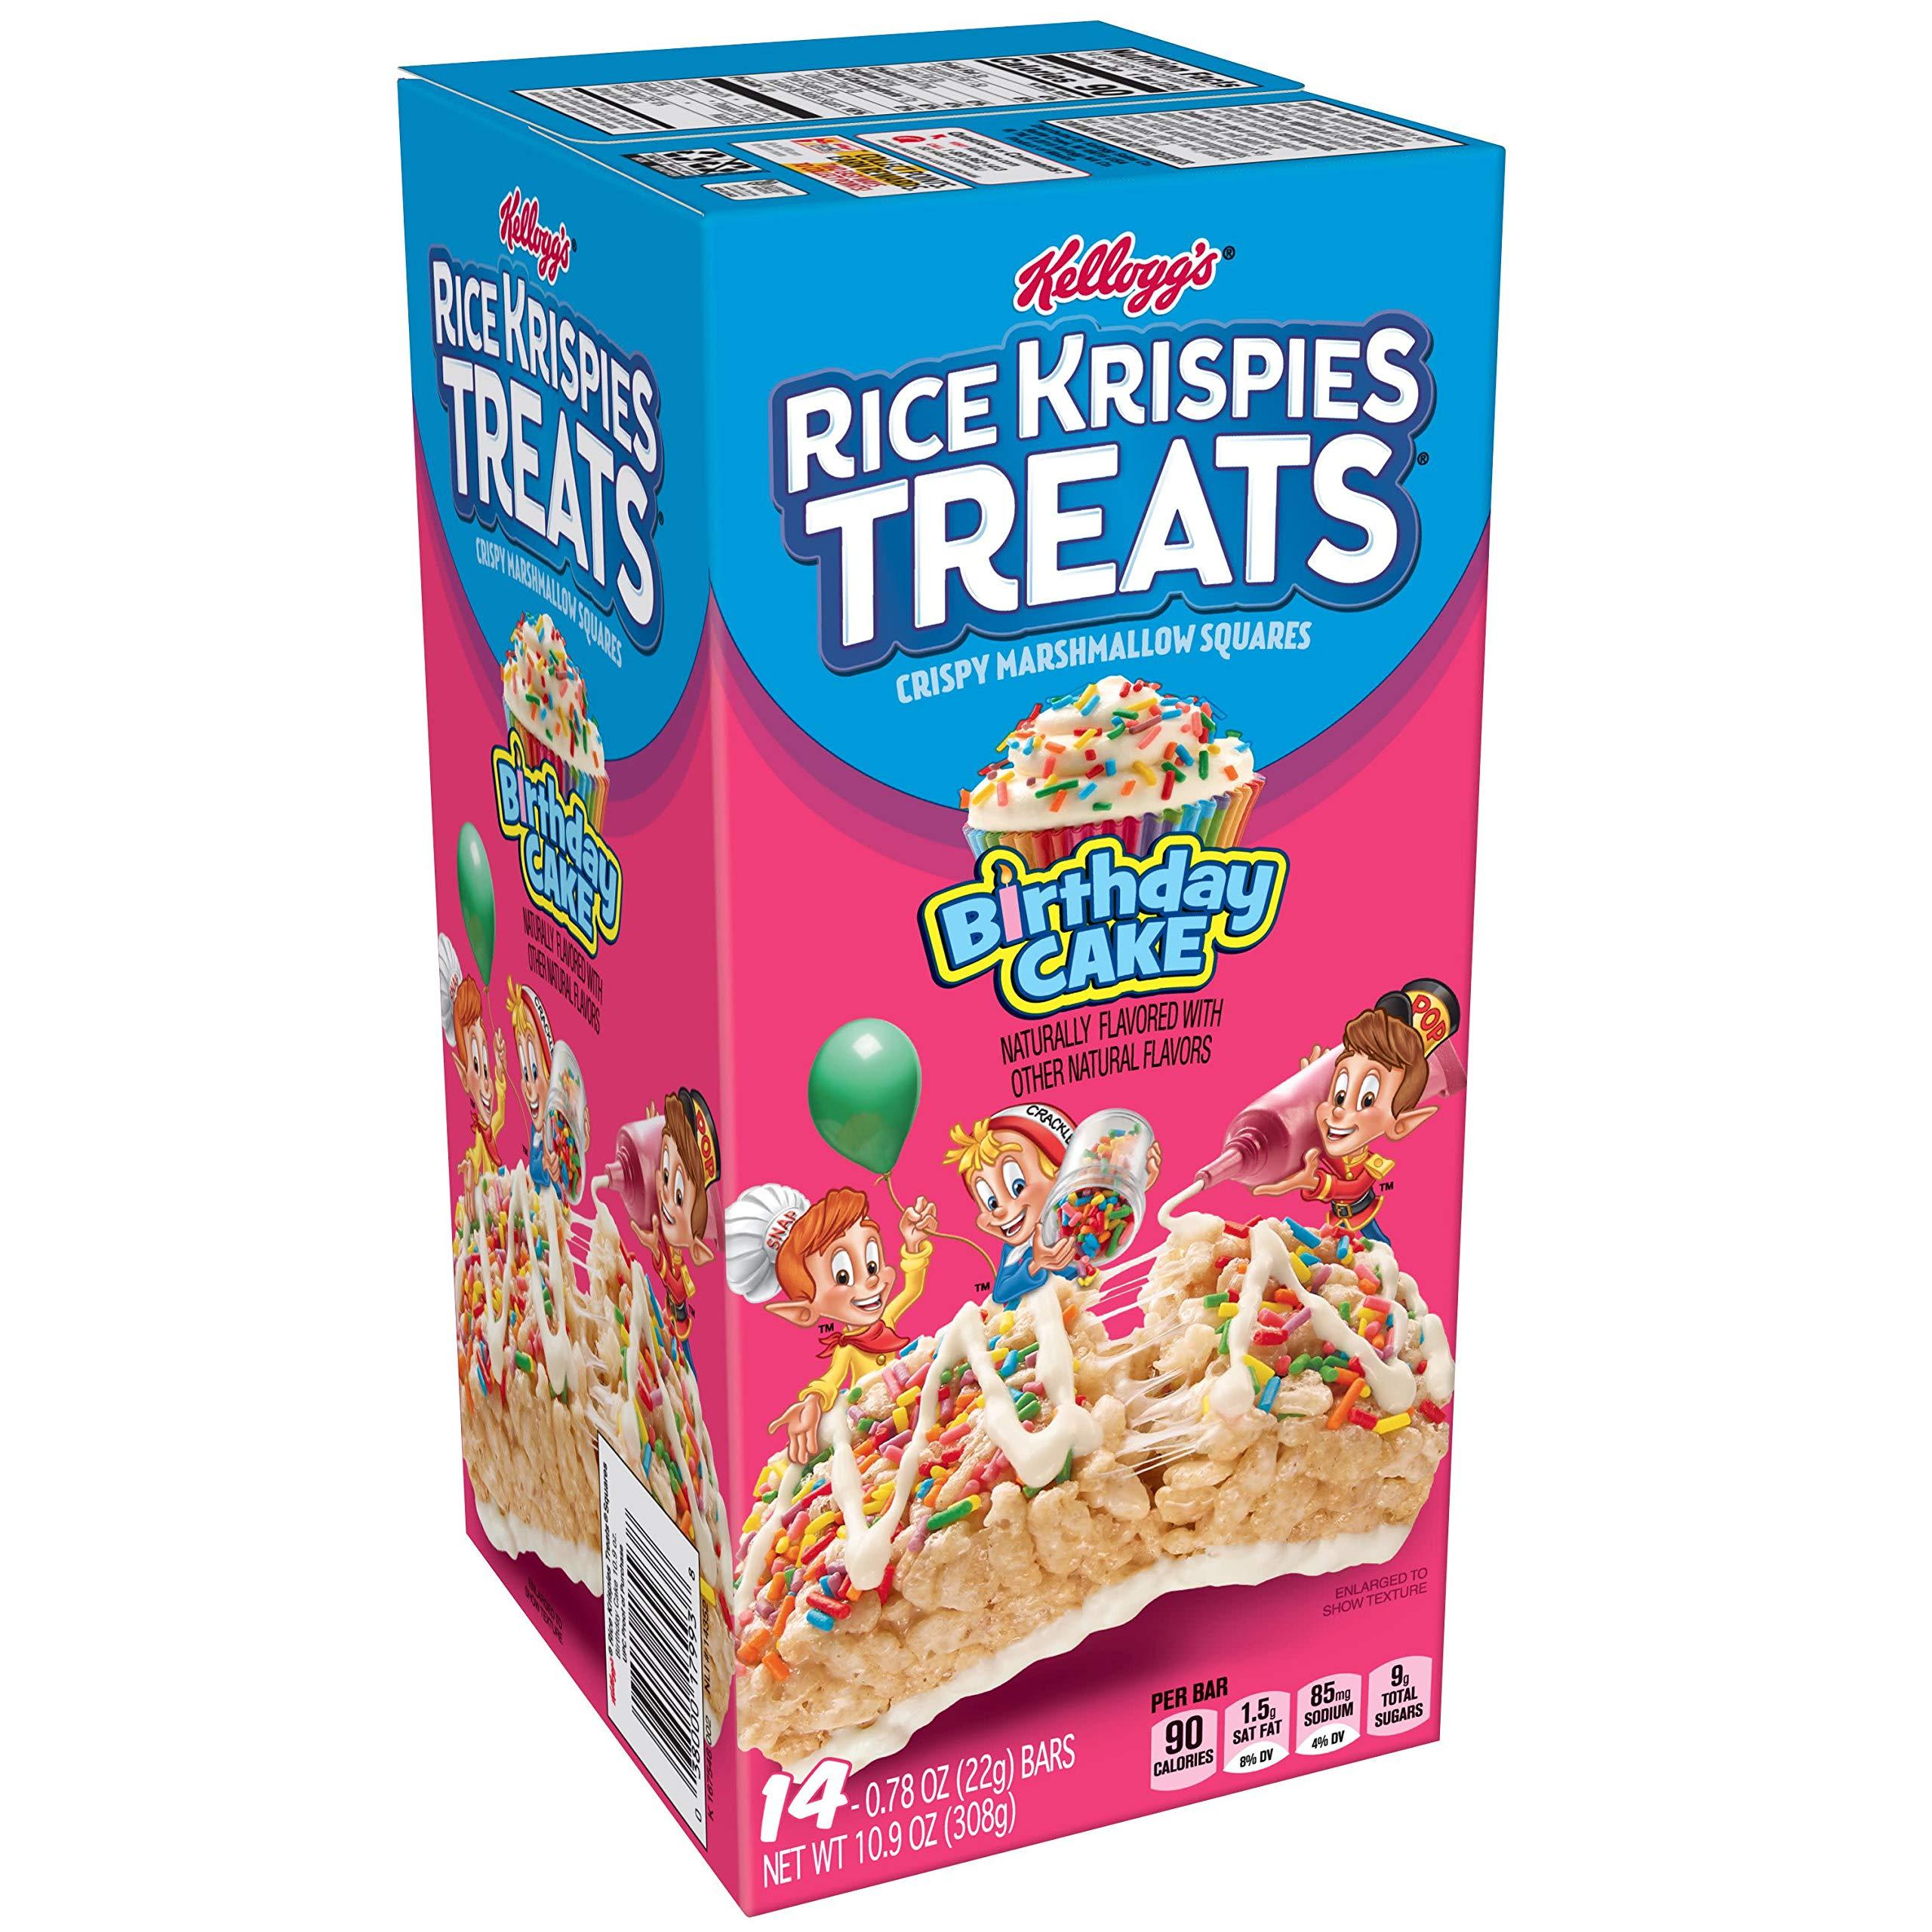 Rice Krispies: Amazon.com: Kellogg's Rice Krispies Treats Crispy